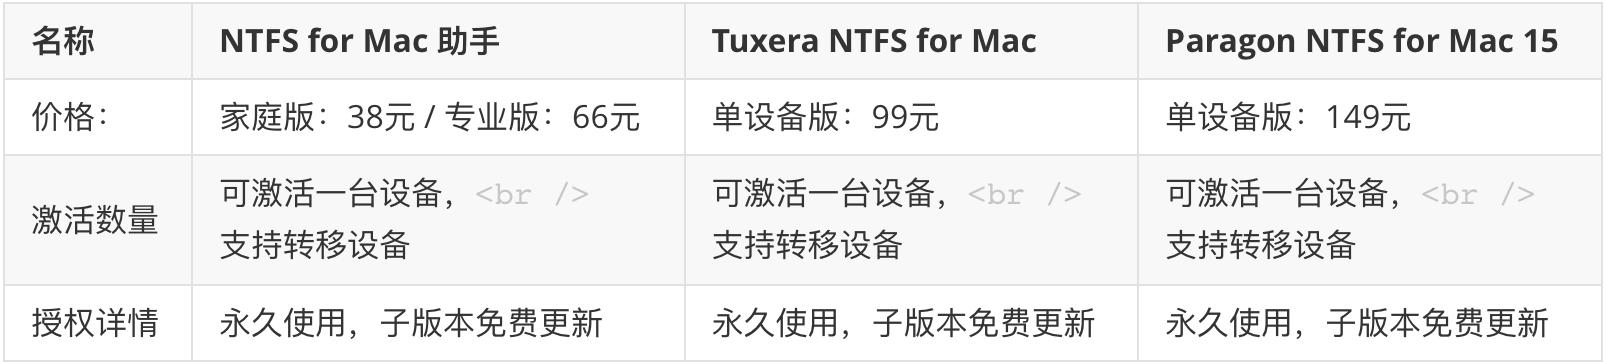 NTFS 软件对比